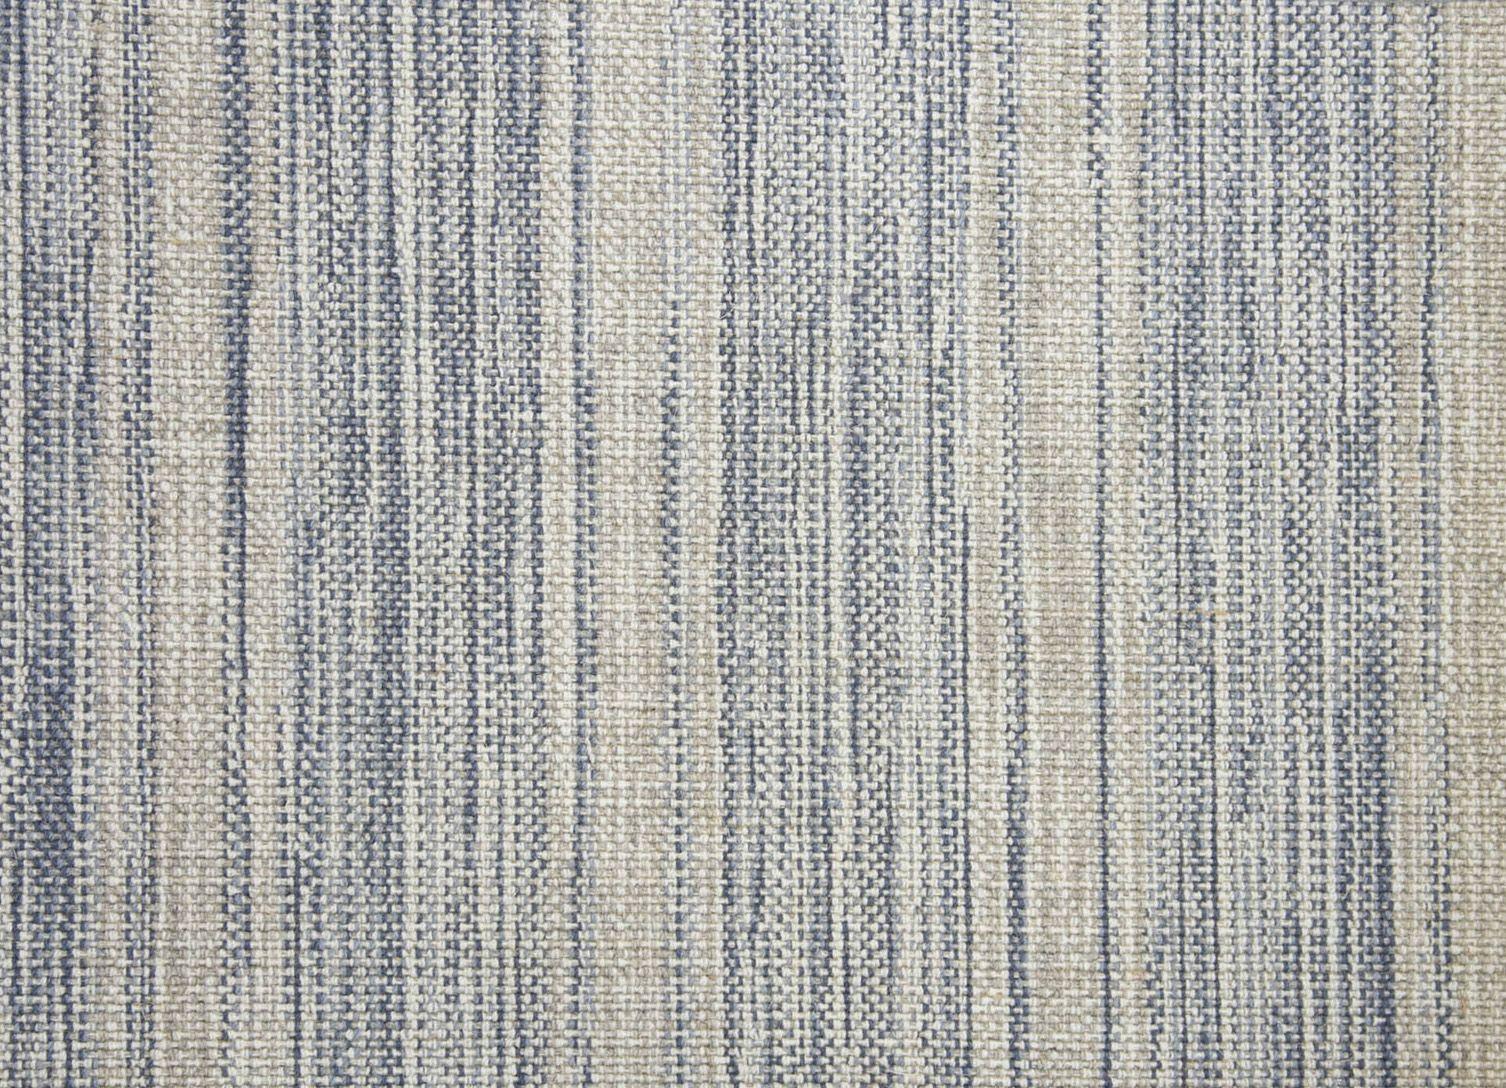 Rustigian Rugs Custom Wall To Wall Carpeting Showroom Providence Ri In 2020 Custom Wall Carpet Pet Friendly Carpets